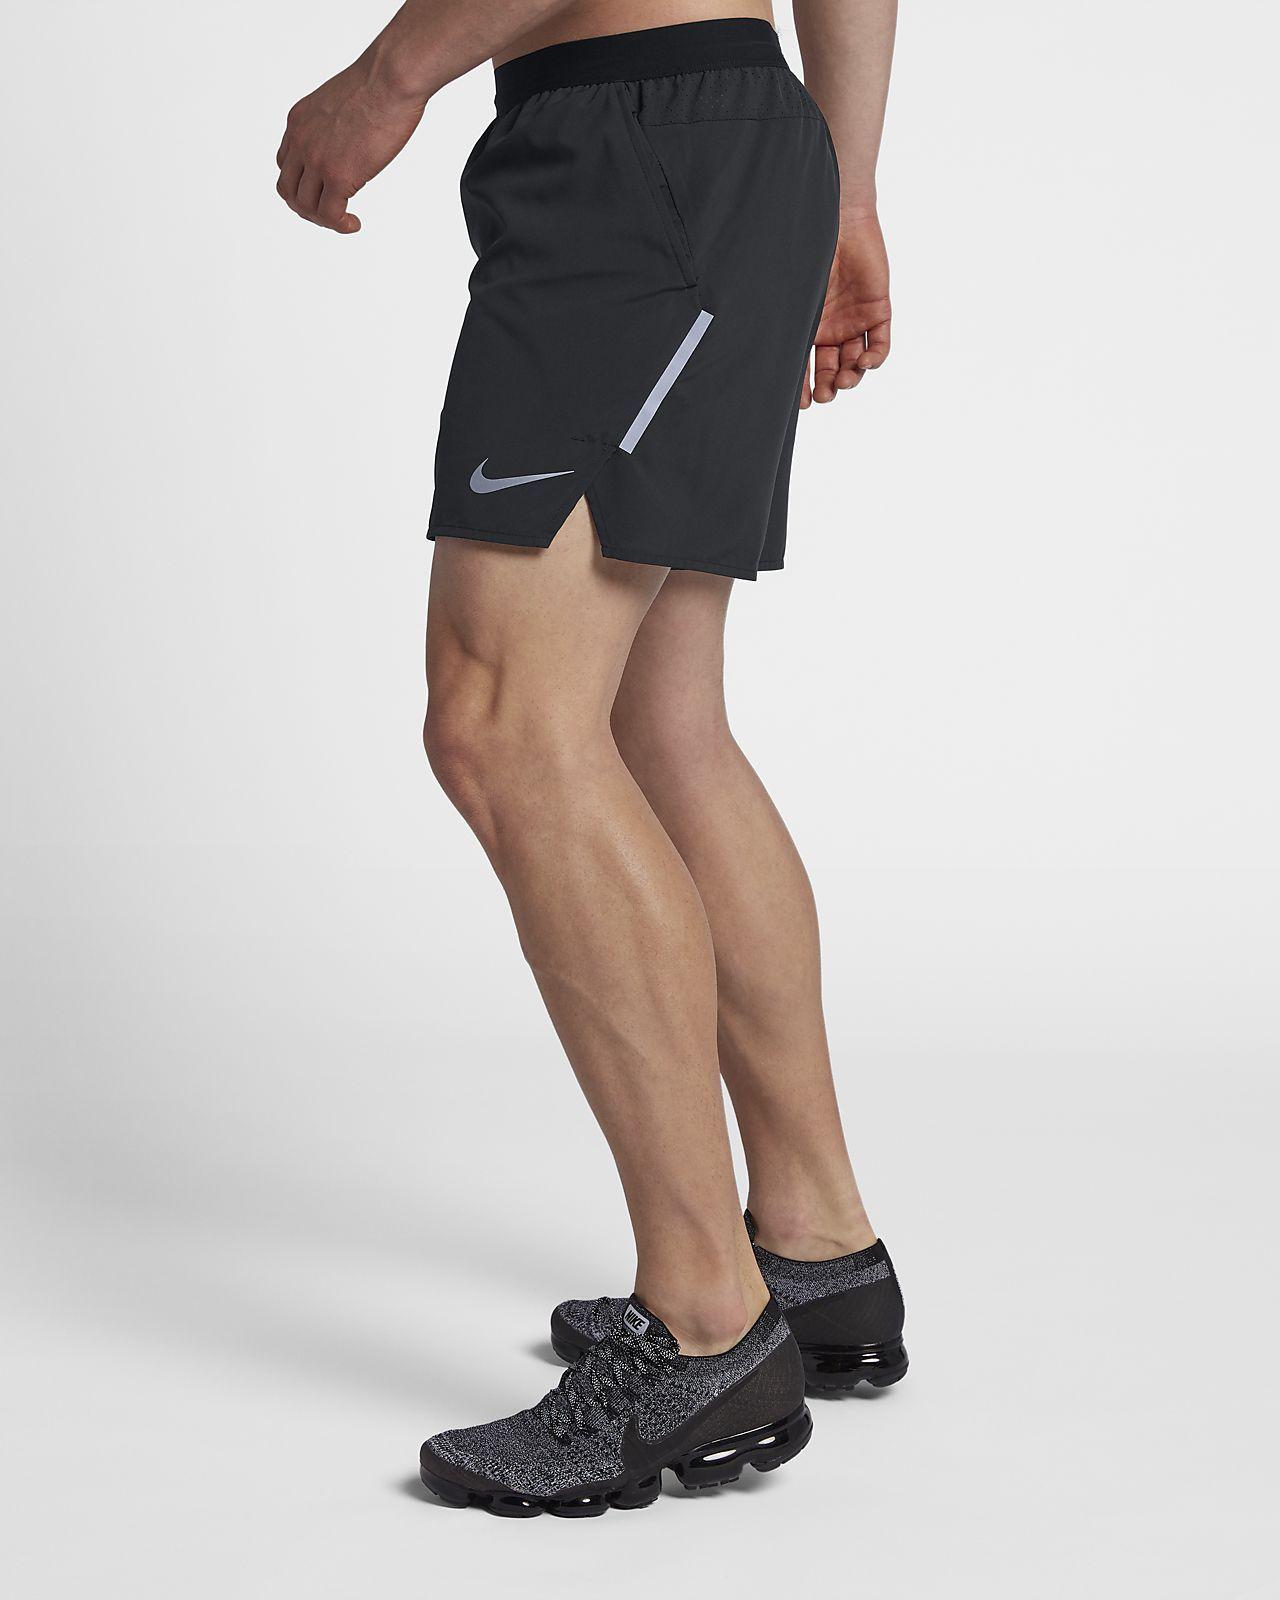 "Nike Distance Men's 5\"" Lined Running Shorts Running"